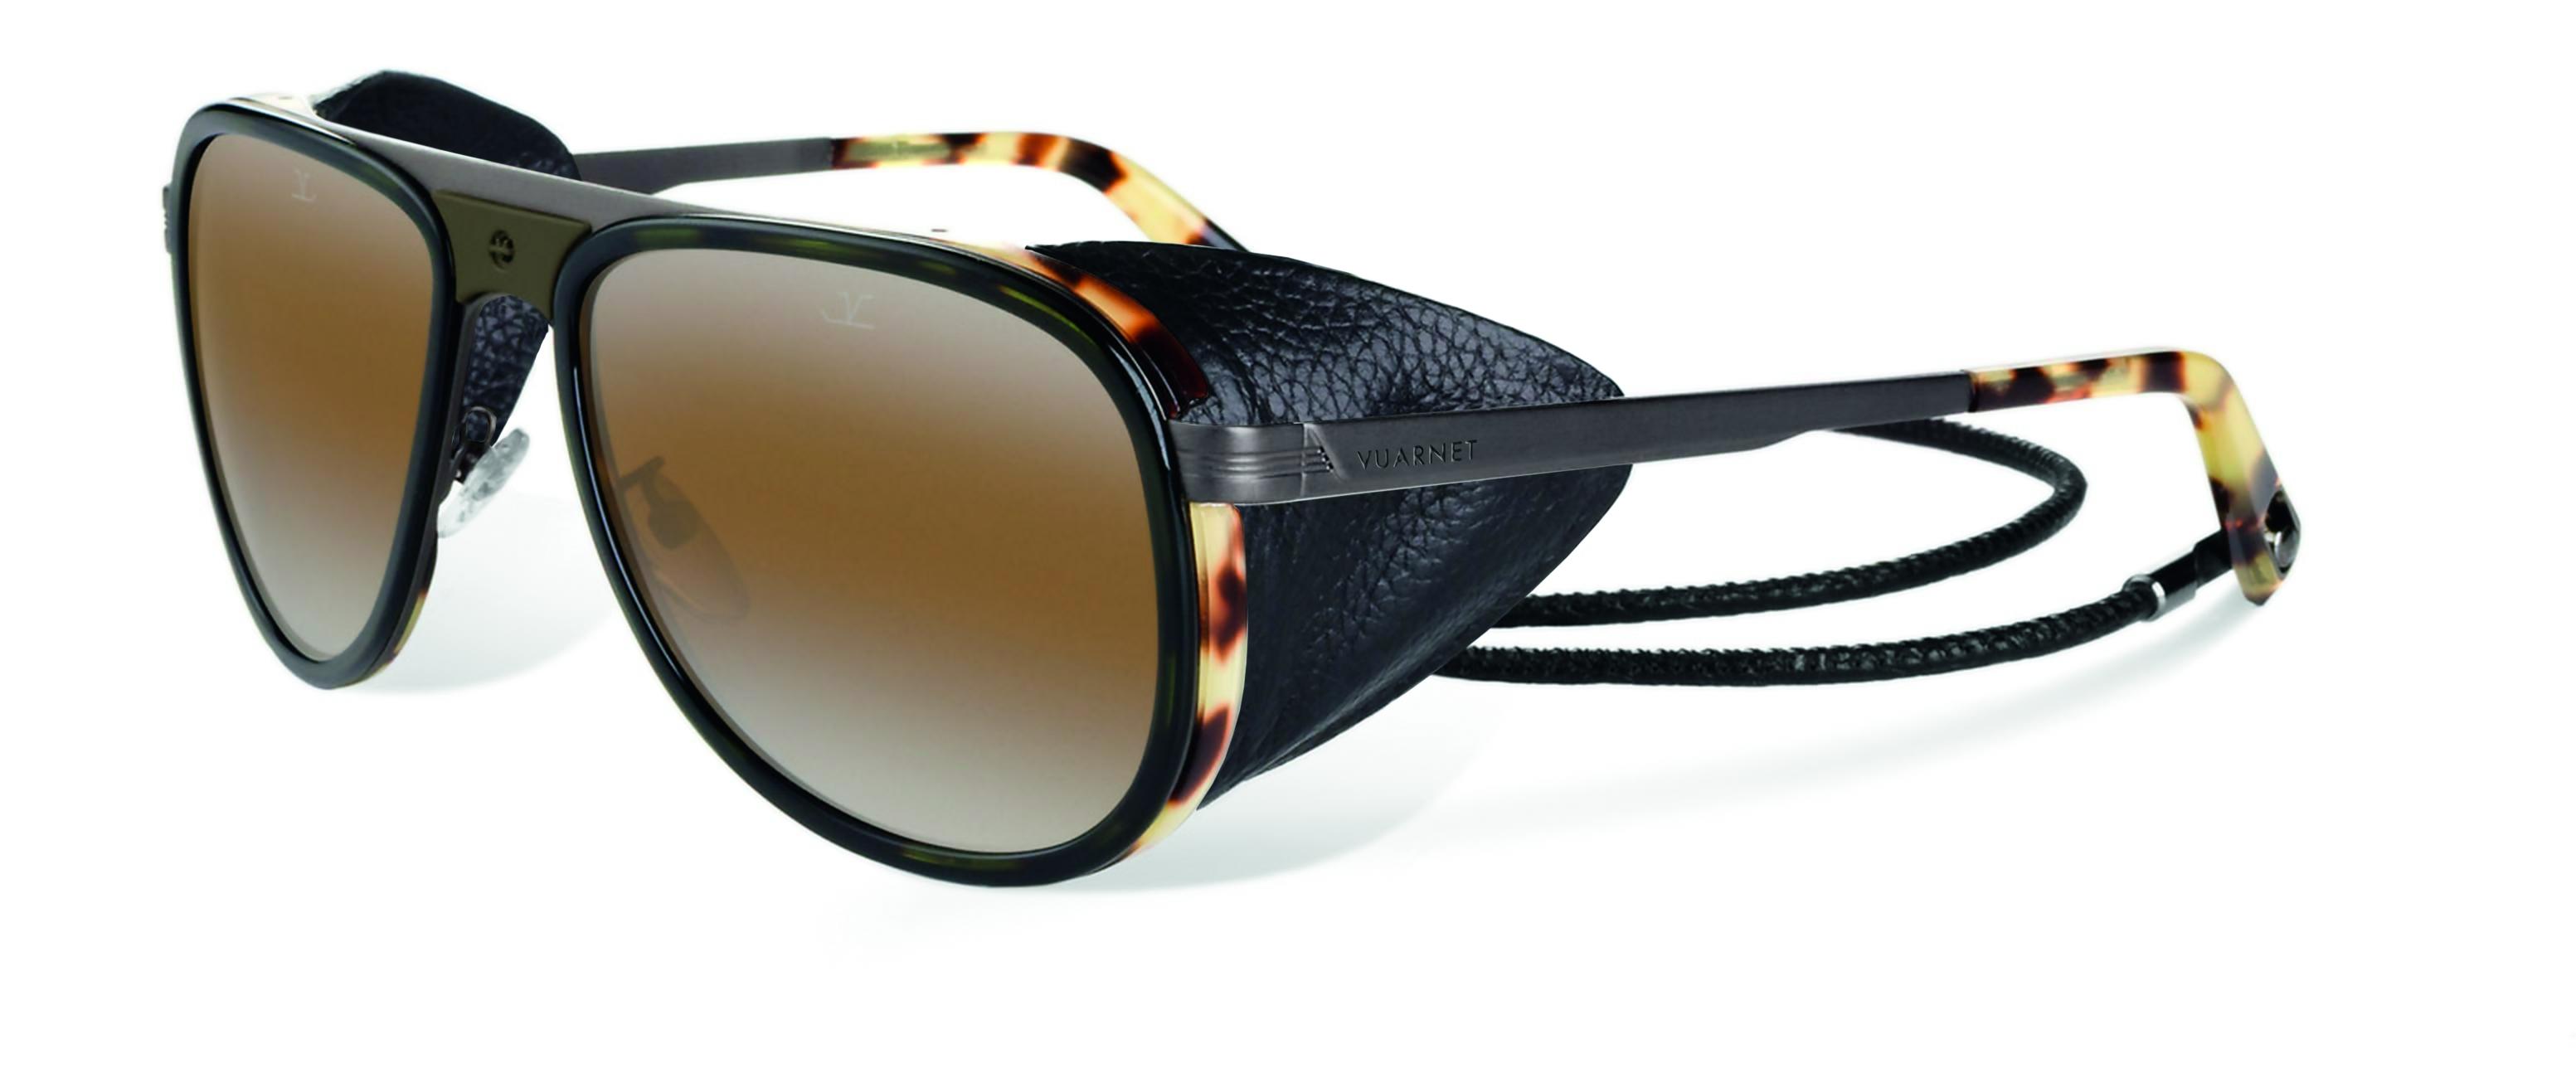 VUARNET Glacier - Dark tortoise acetate with SX2000 lens